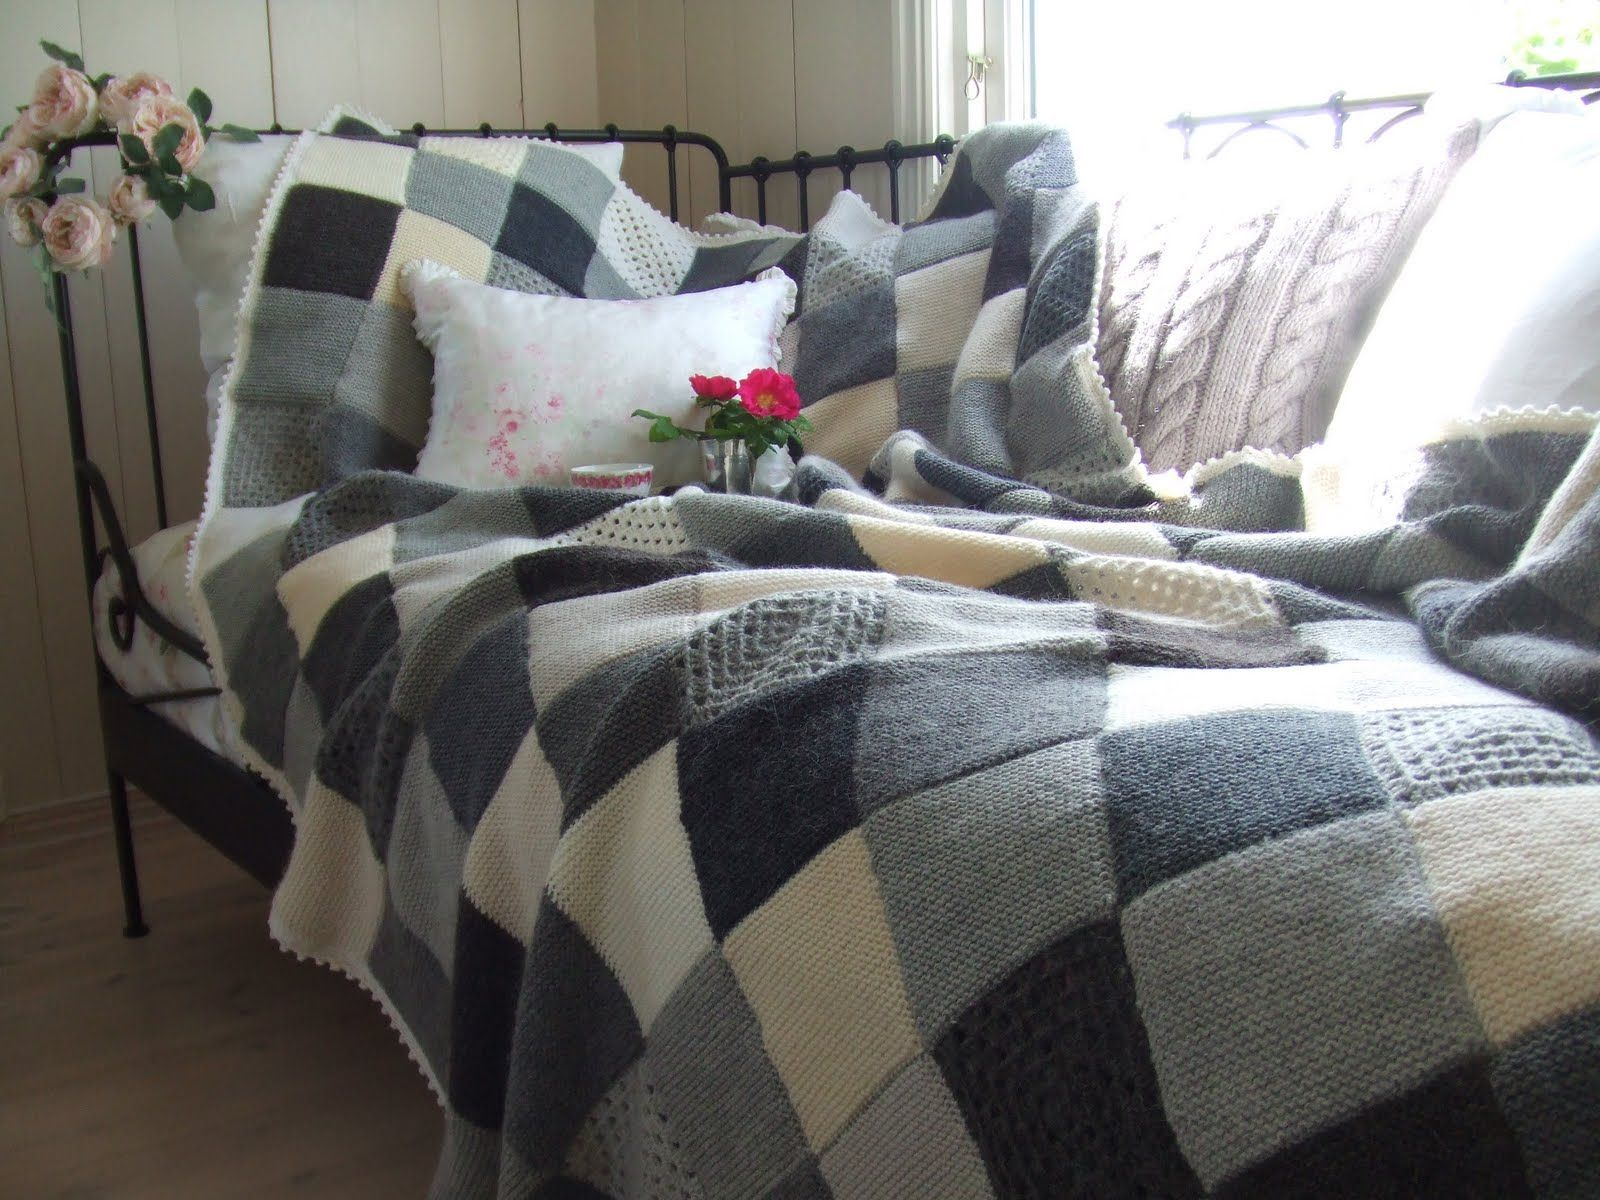 Mias Landliv: The grey blanket  Mias Landliv: The grey blanket  #blanket #Grey #Landliv #Mias